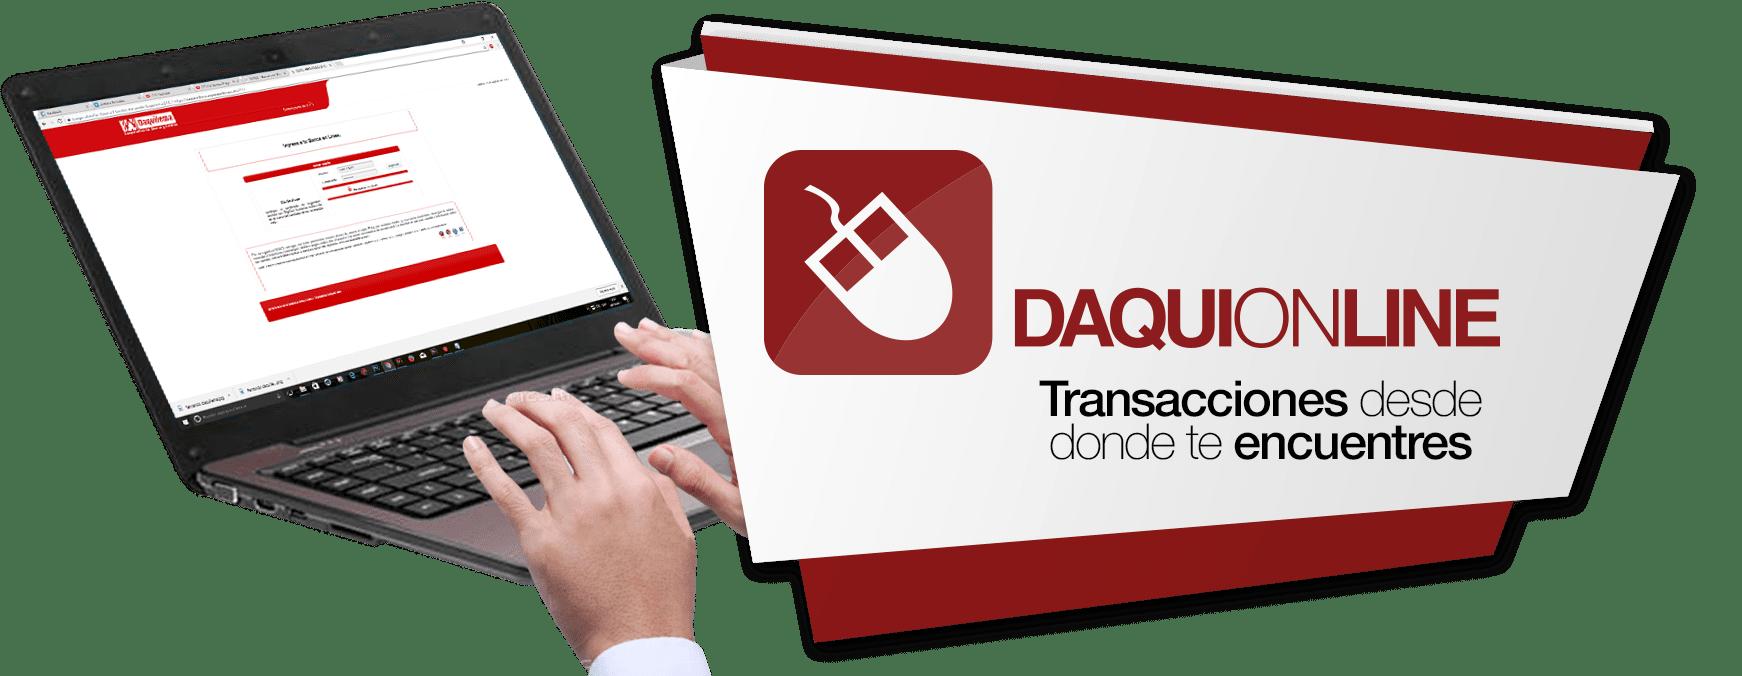 sliders-web-daquionline